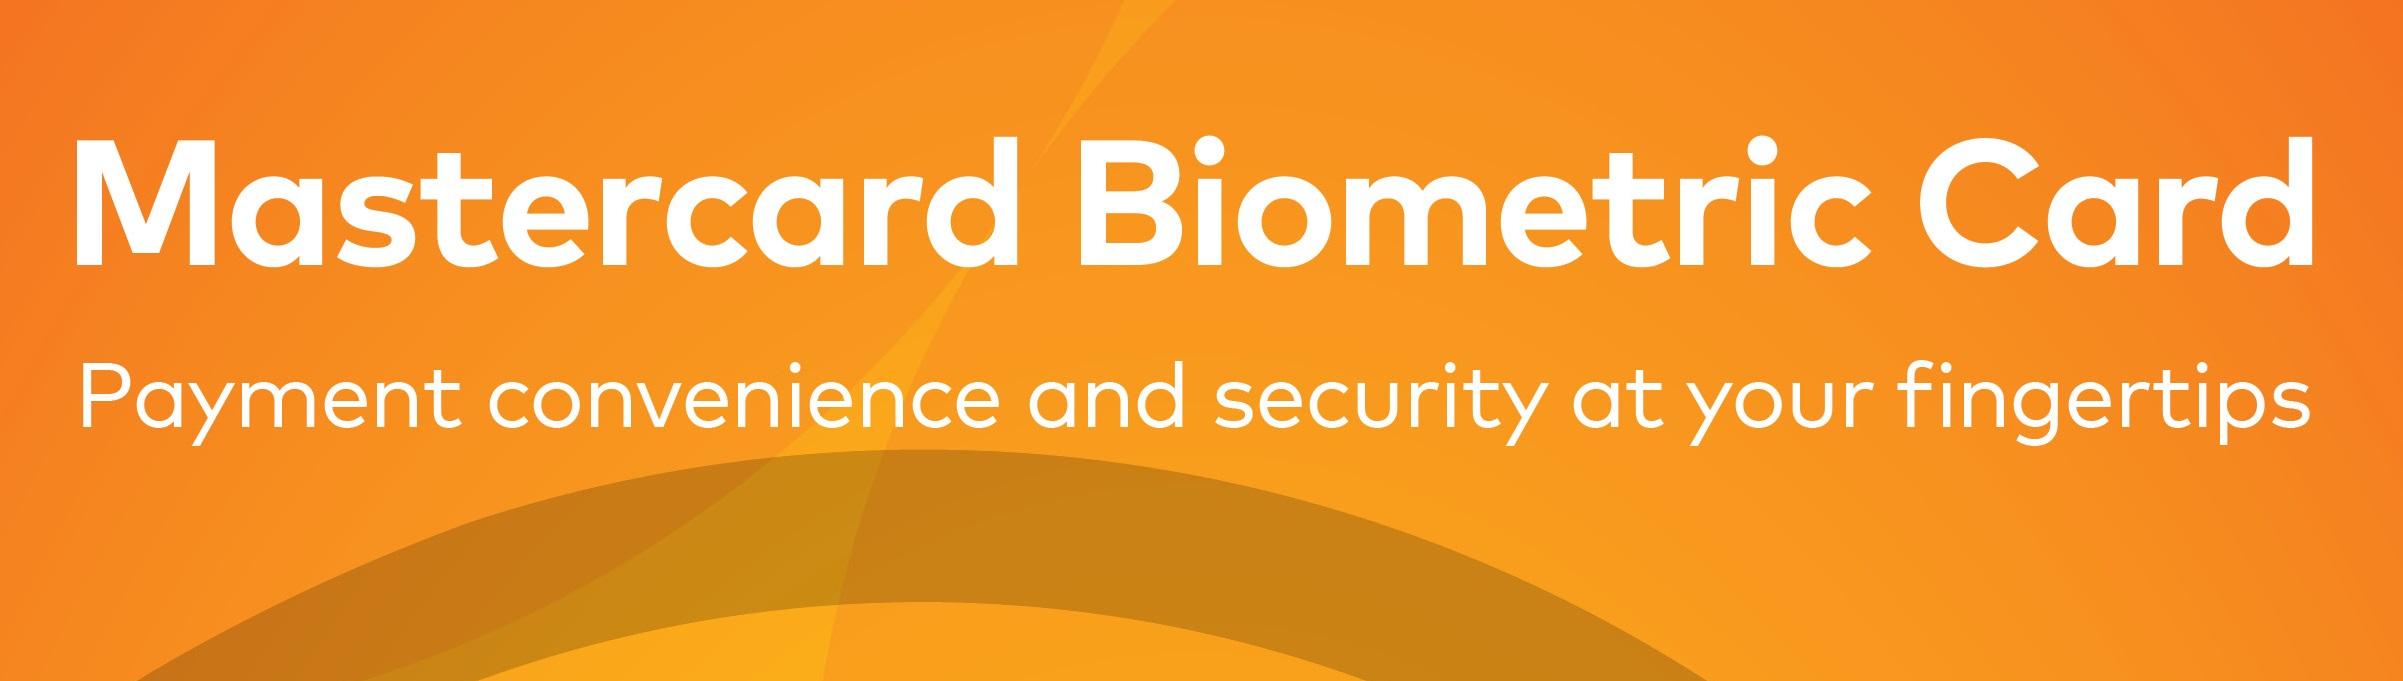 BASYS-Mastercard-Biometric-Card-Header